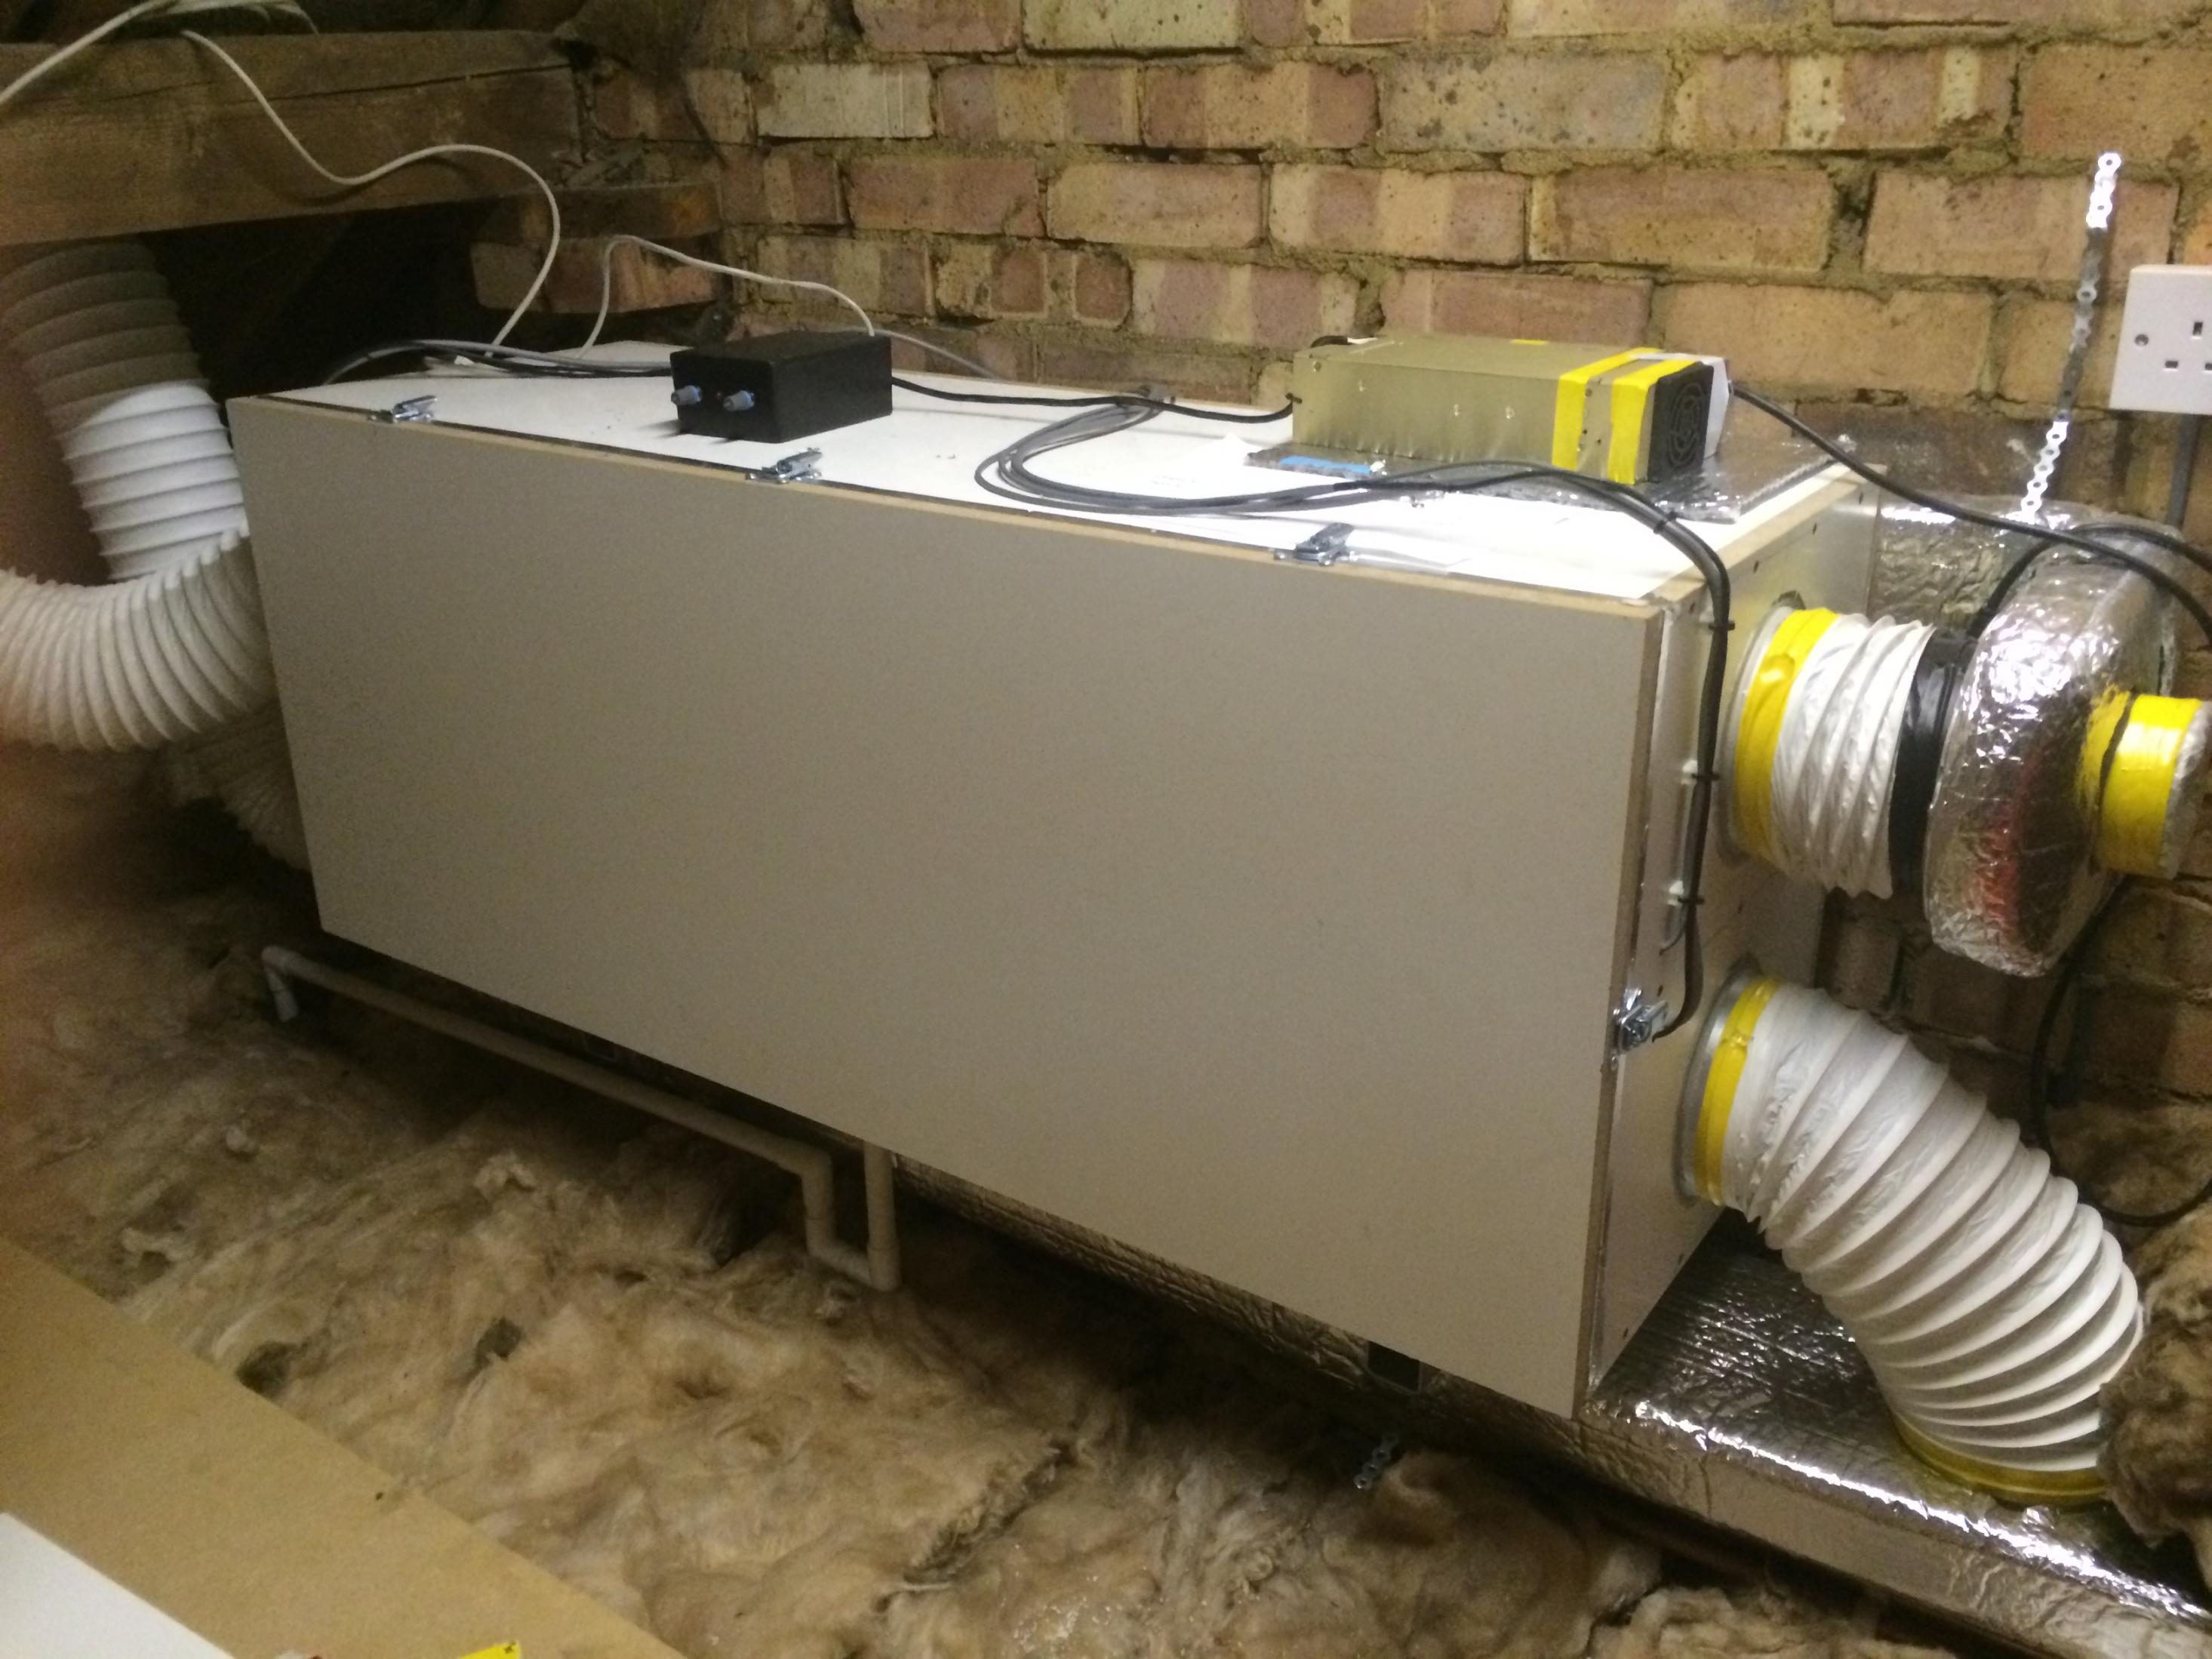 Heat recovery ventilator ebay - 2014 05 30 09 47 50 Jpg